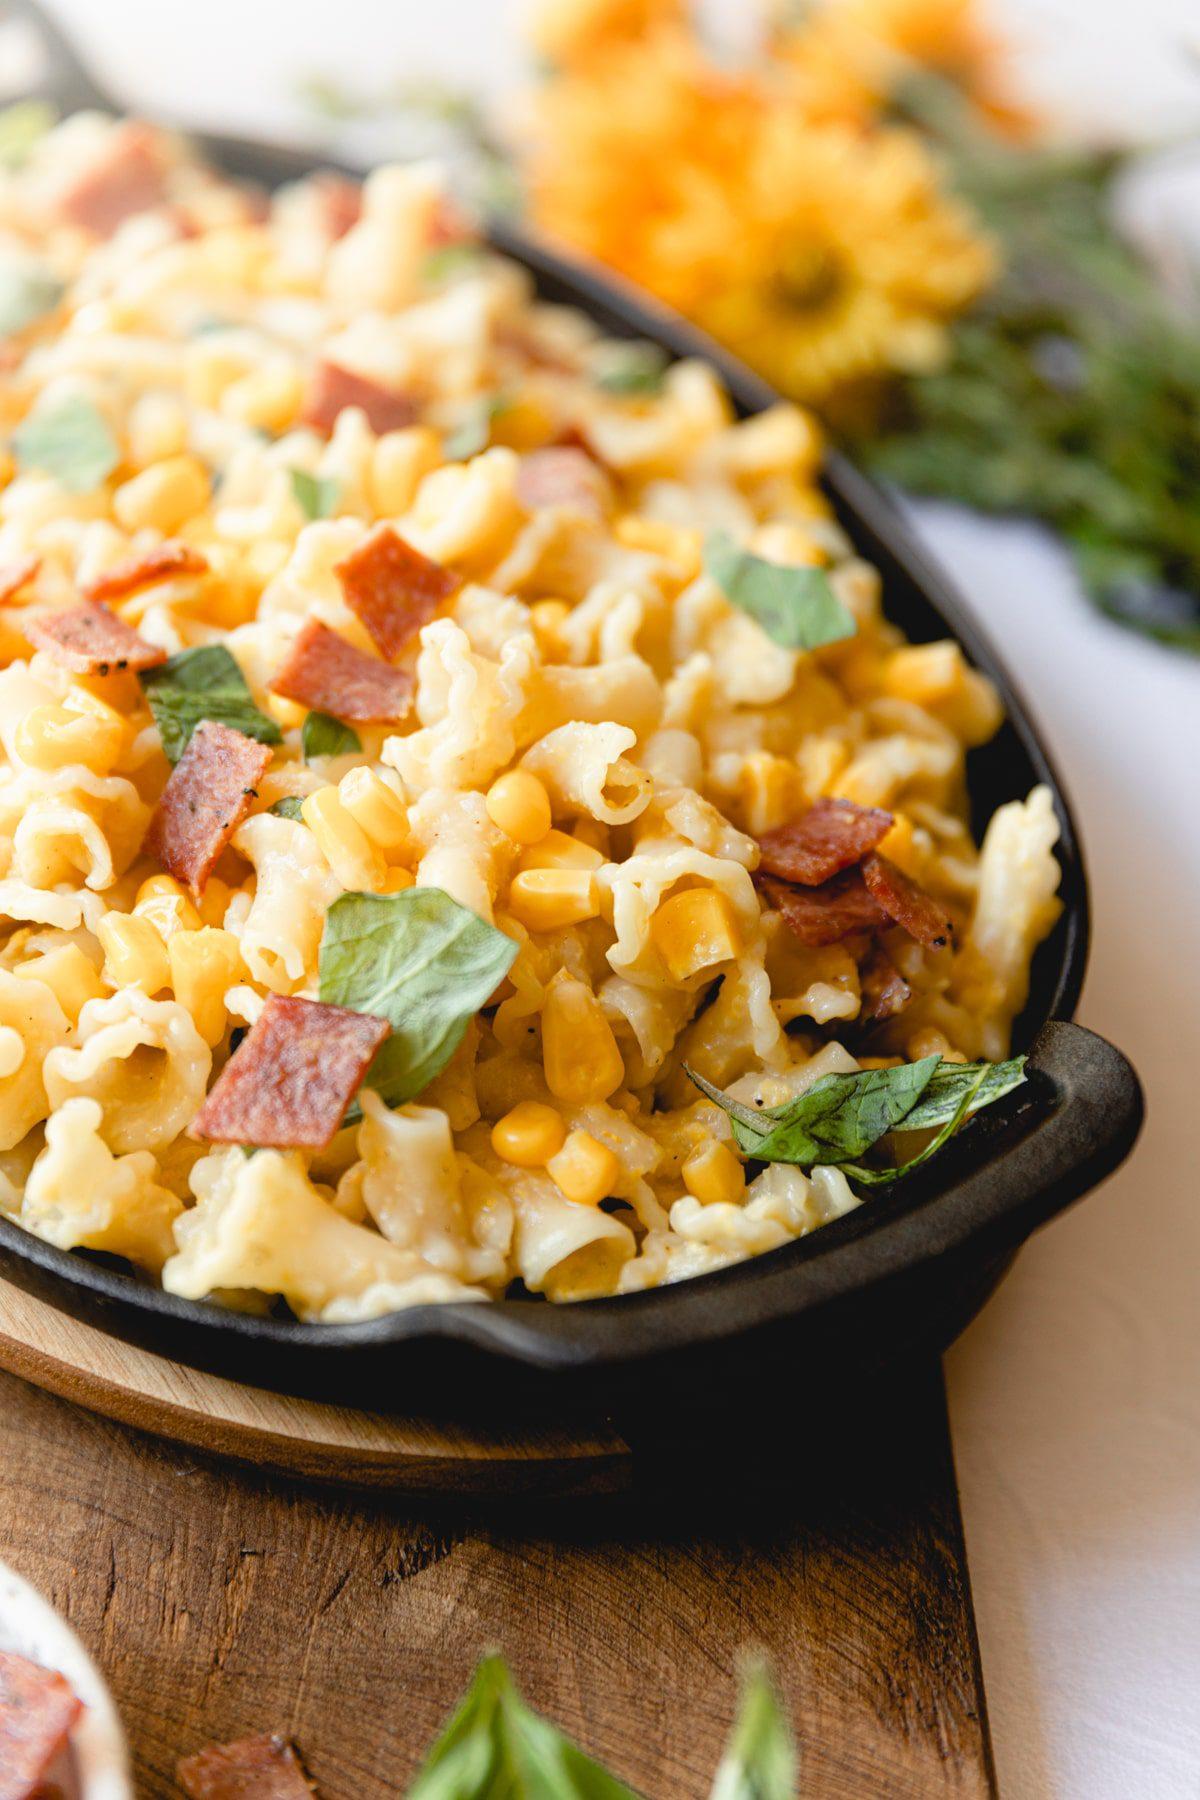 skillet full of bacon corn pasta